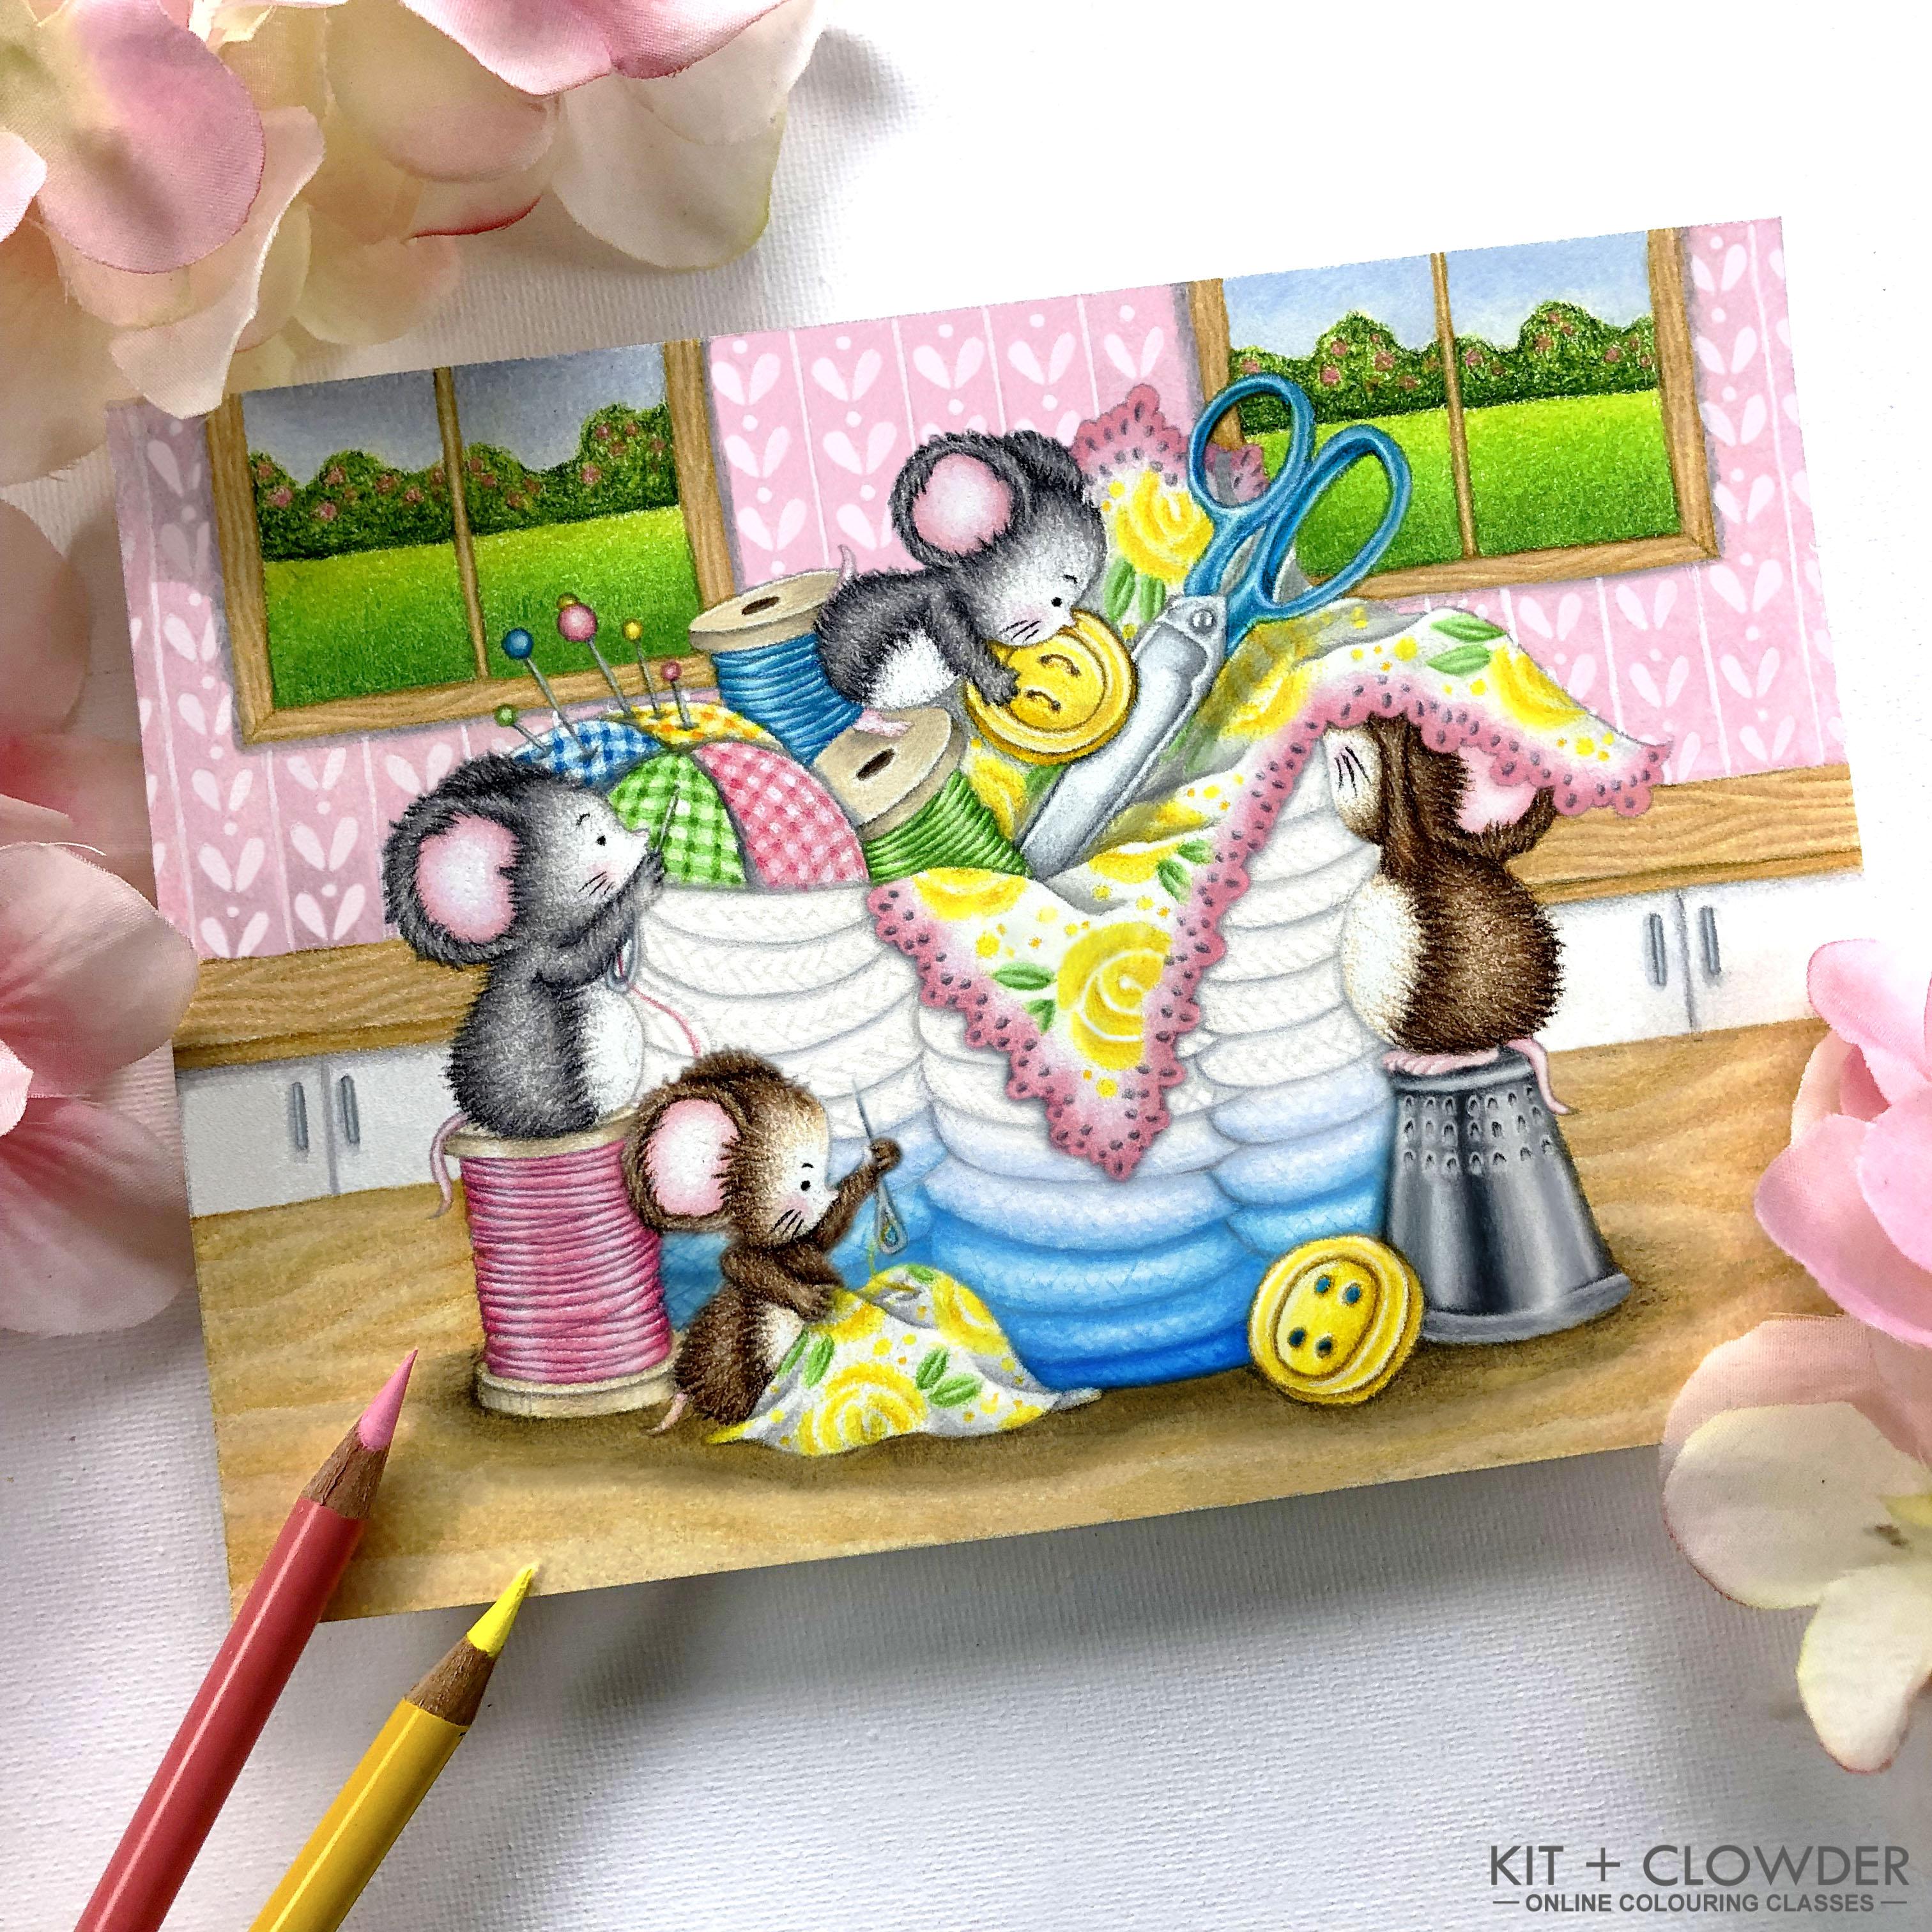 Pencils June 19